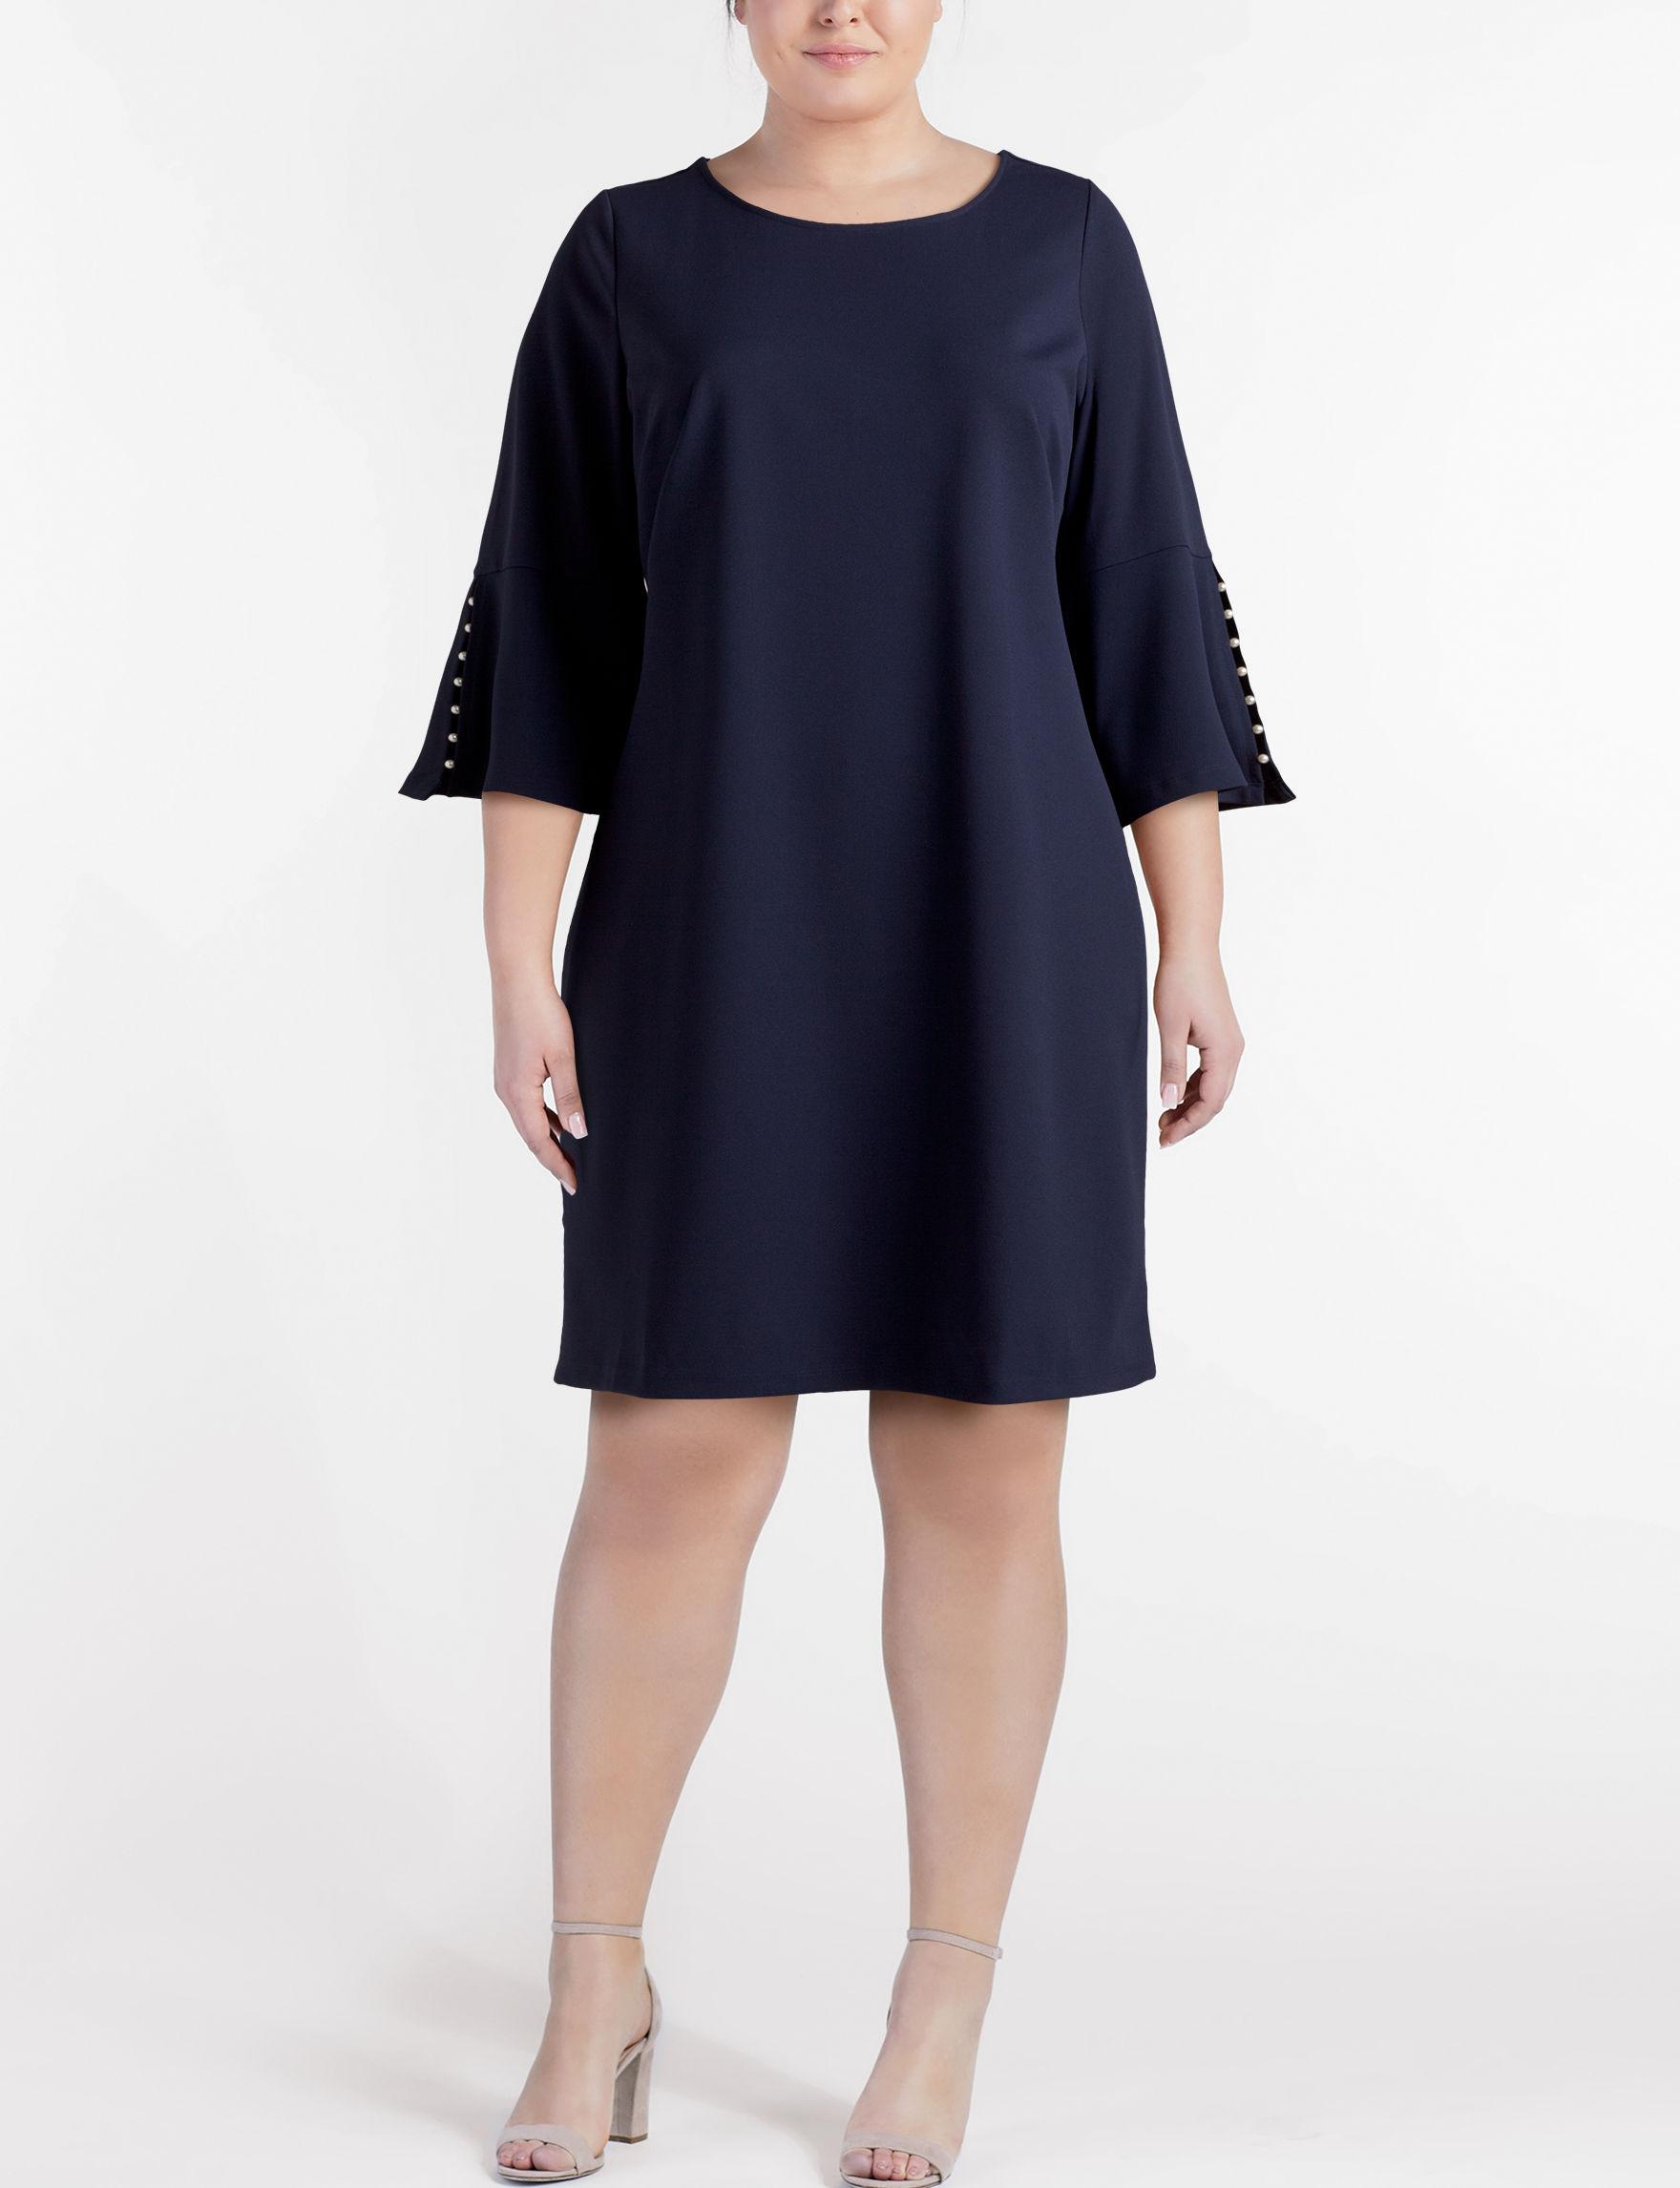 Nina Leonard Navy Everyday & Casual A-line Dresses Fit & Flare Dresses